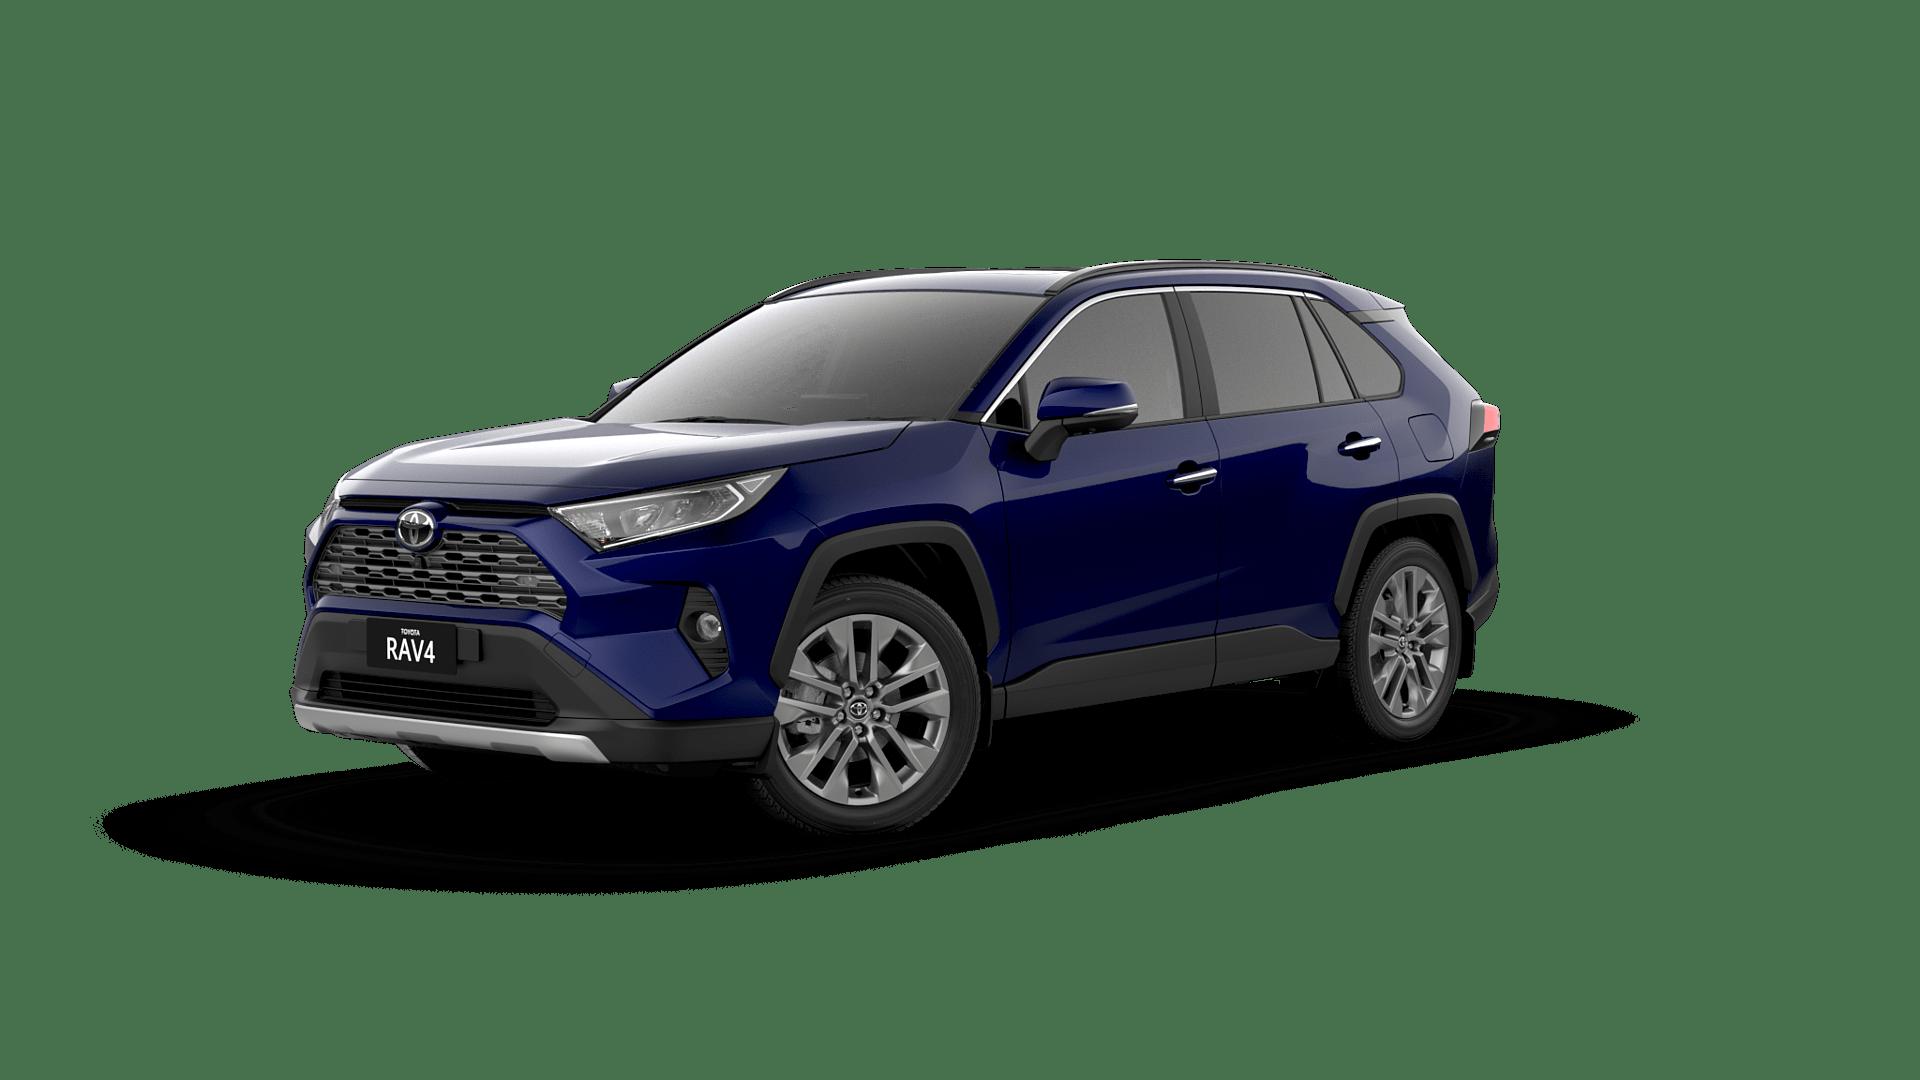 2020 Toyota RAV4 Cruiser 2WD 2.0L Petrol Auto CVT 5 Door Wagon